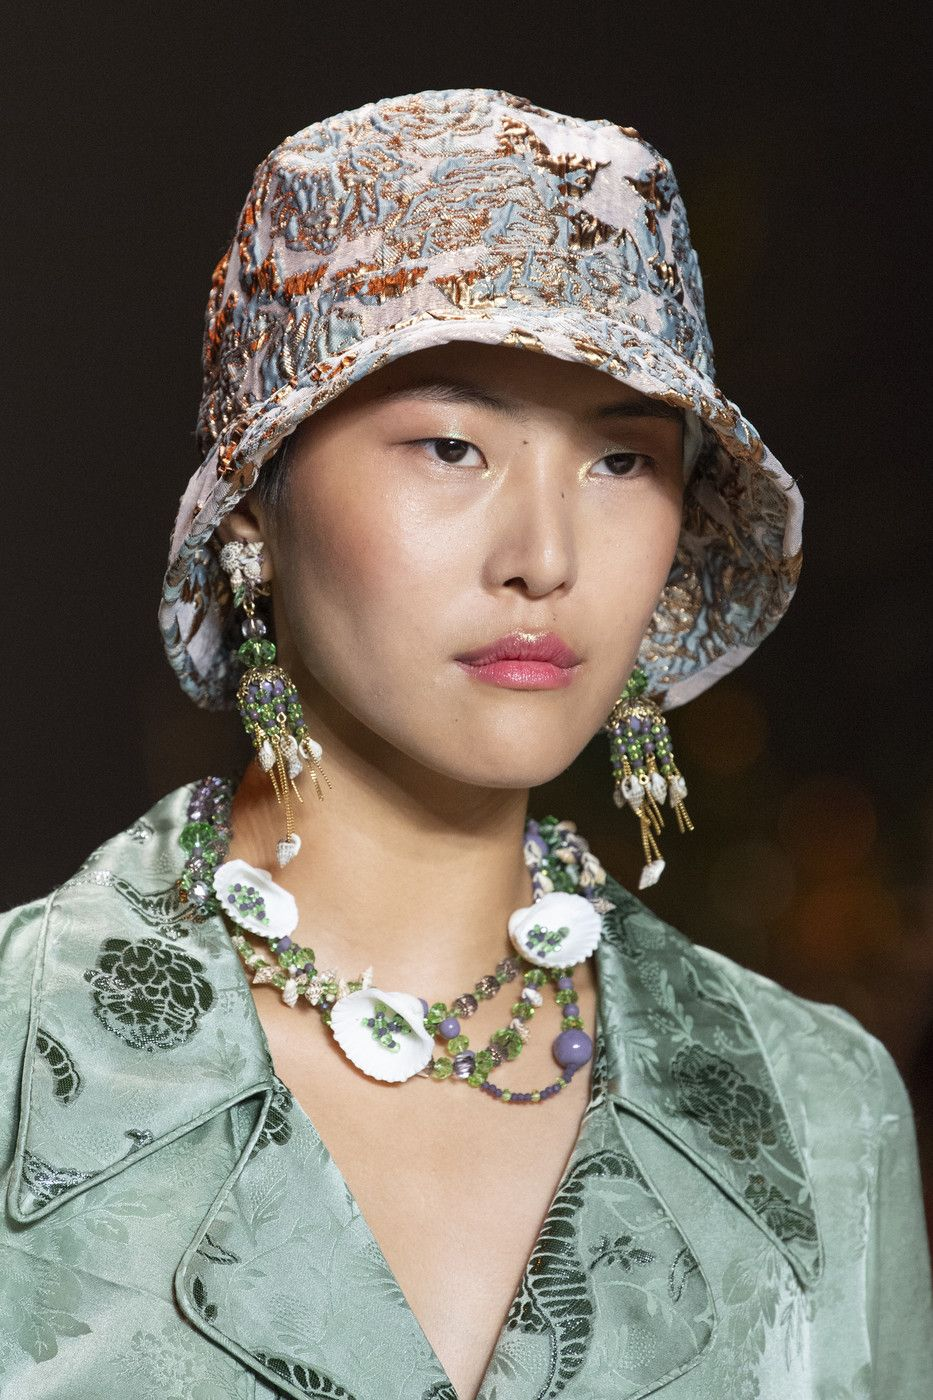 Anna Sui at New York Fashion Week Spring 2019 Spring